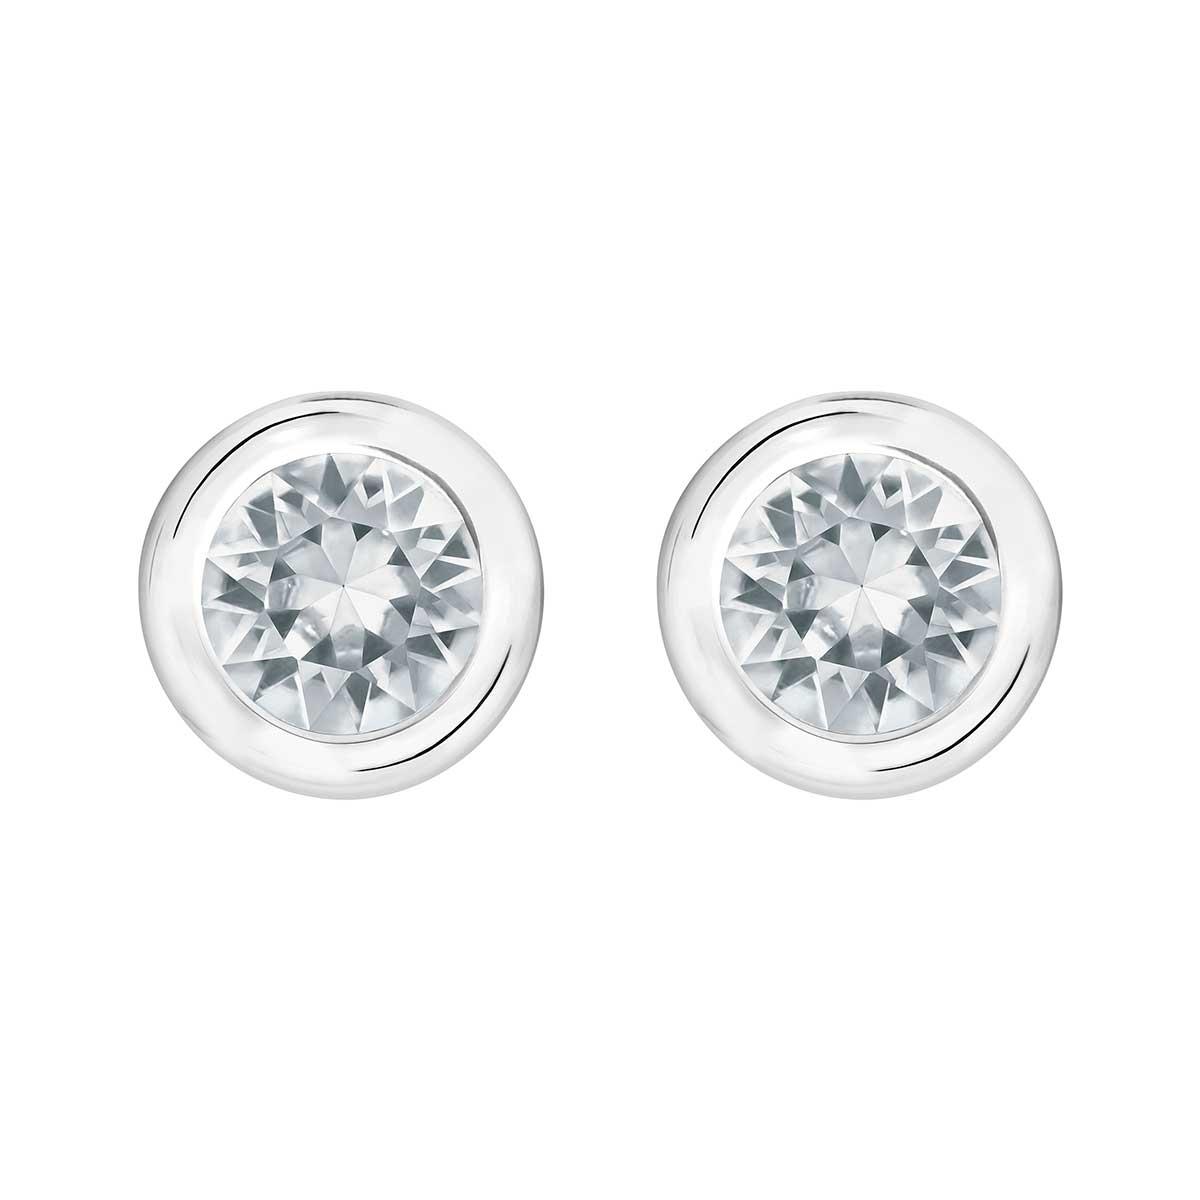 81c5d0785 Swarovski Larger Harley Pierced Earrings: Precious Accents, Ltd.